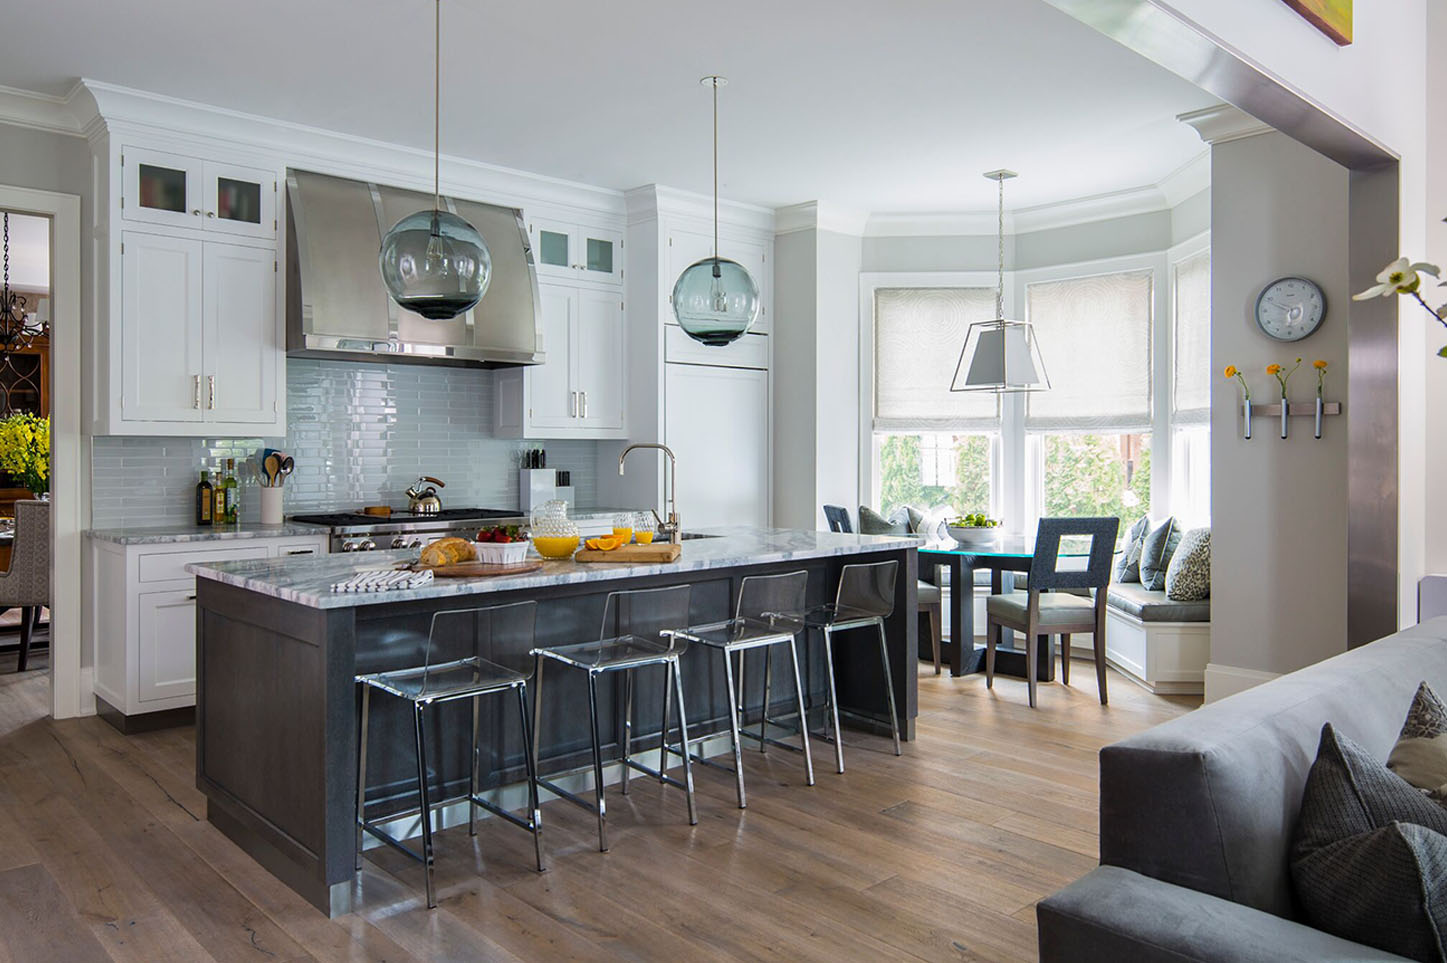 Fareri Associates residential development